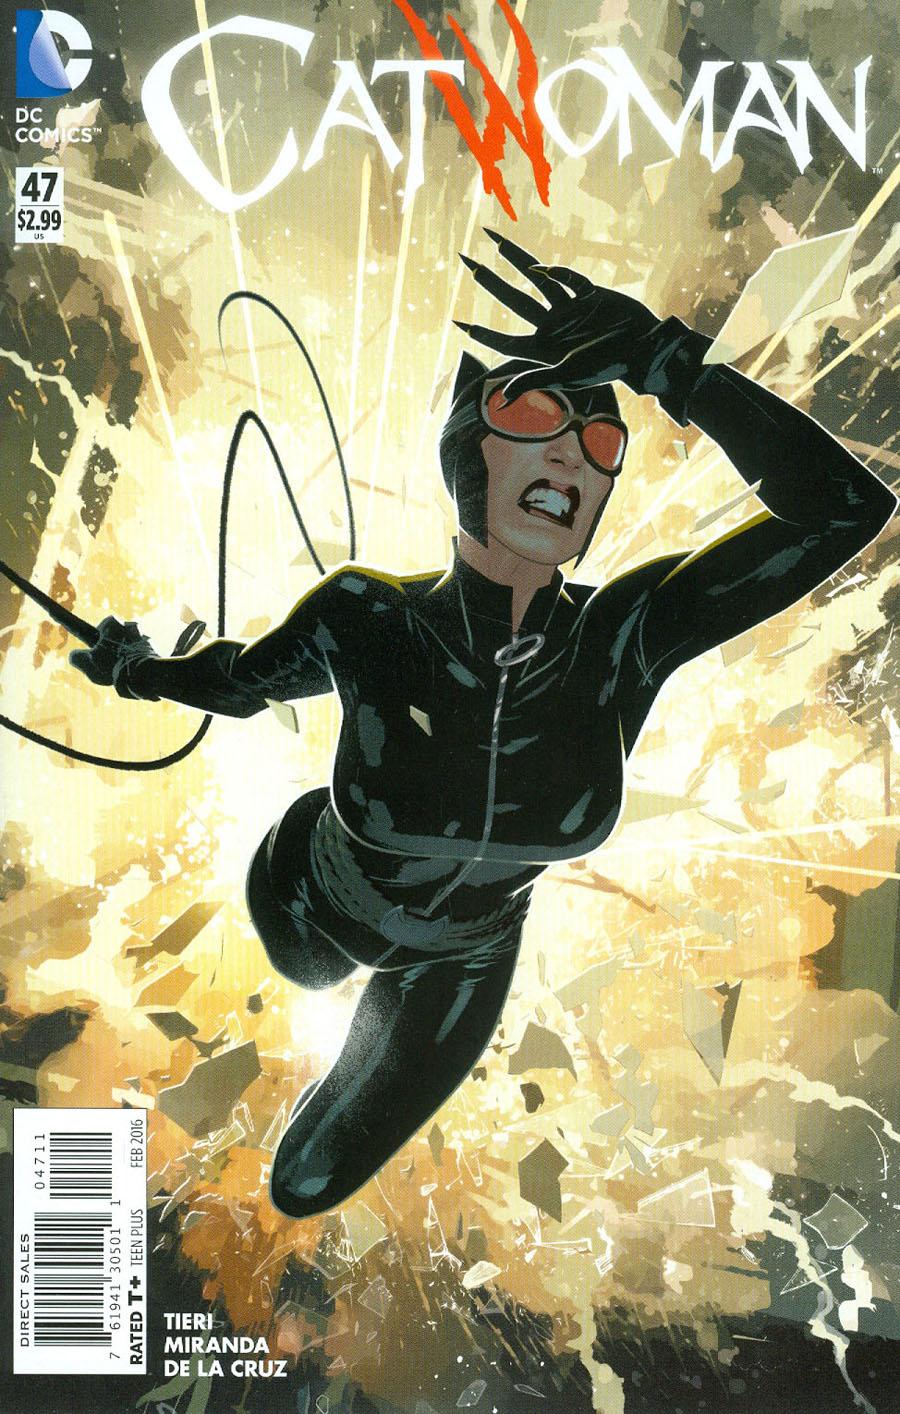 Catwoman Vol 4 #47